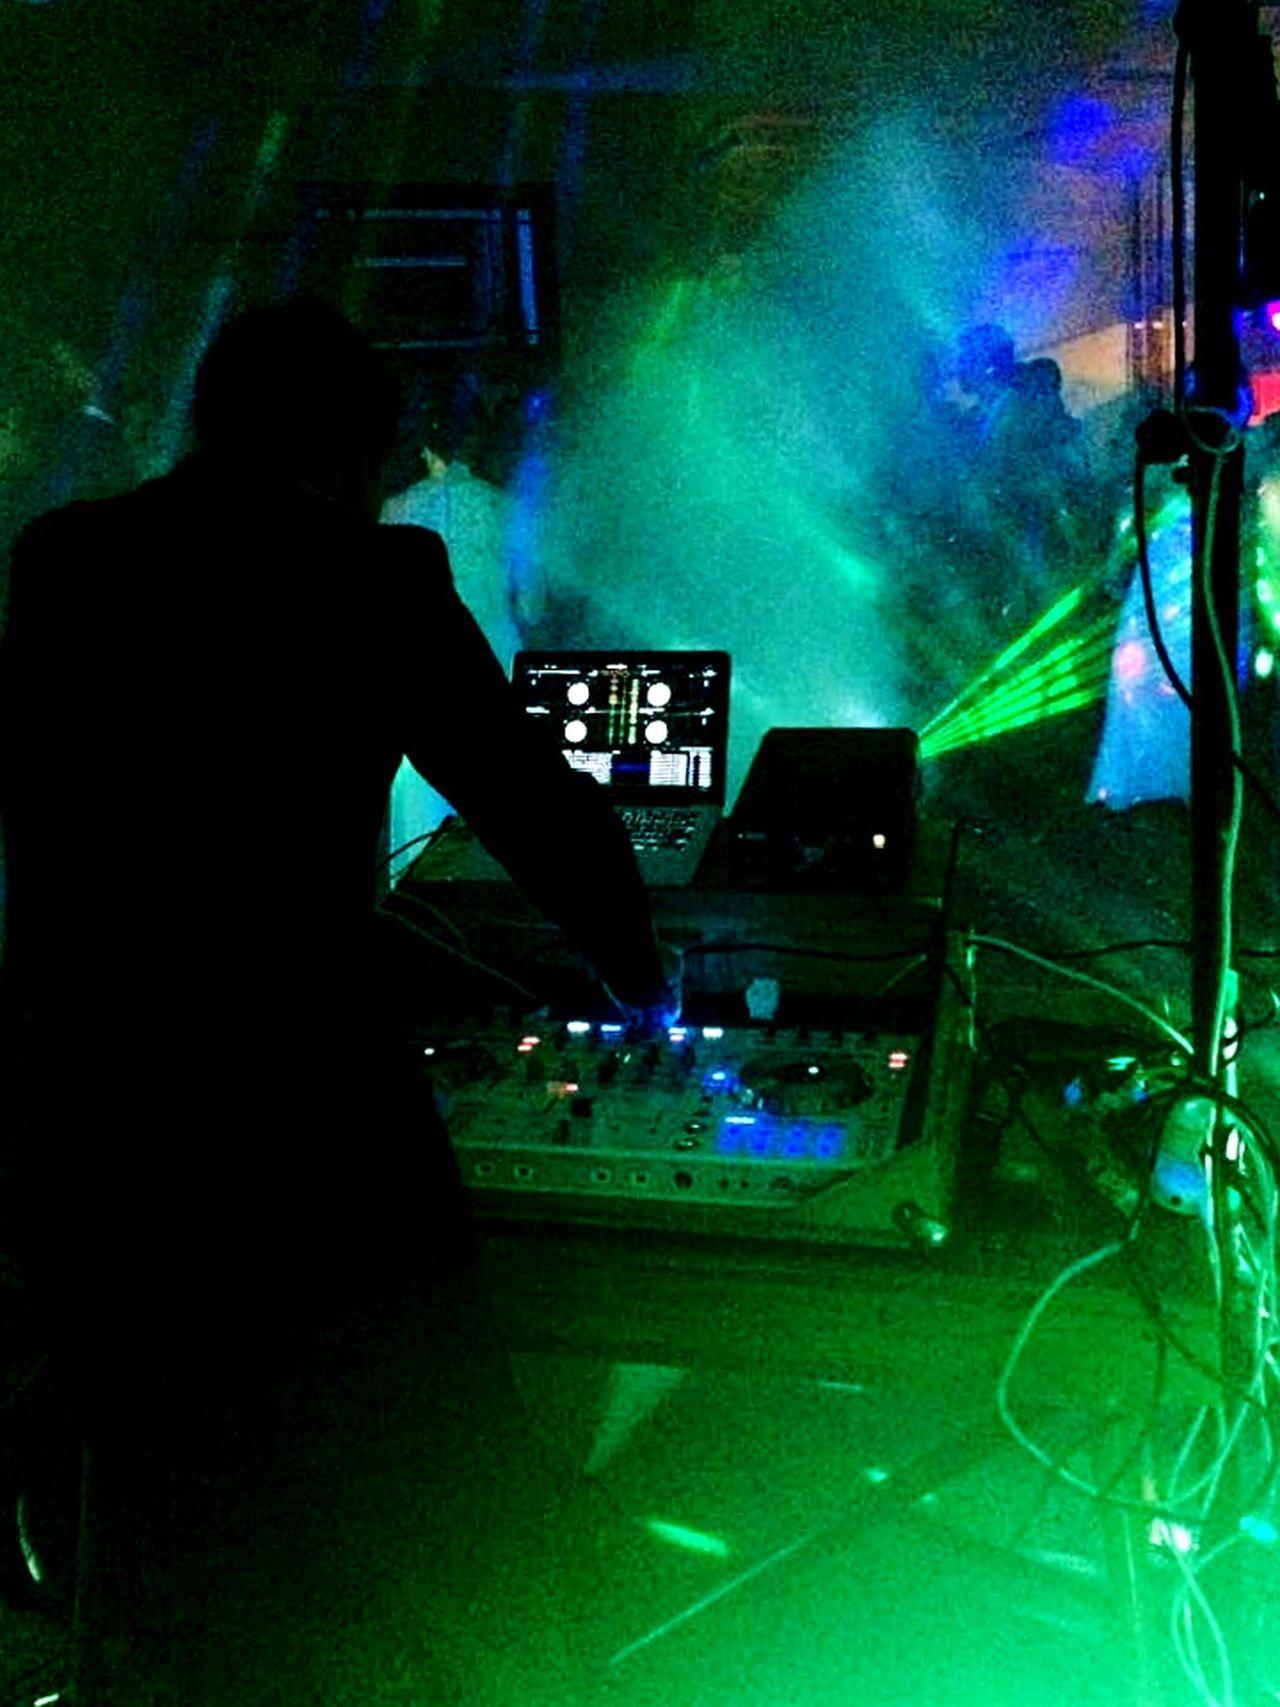 Whangarei Girls high Ball DJing Pioneerdj Nightclub Music Myjobdoesntsuck DDJ-SX Professional Bestjobever Performance Stage Lights Beer Bitchdontkillmyvibe💤💤